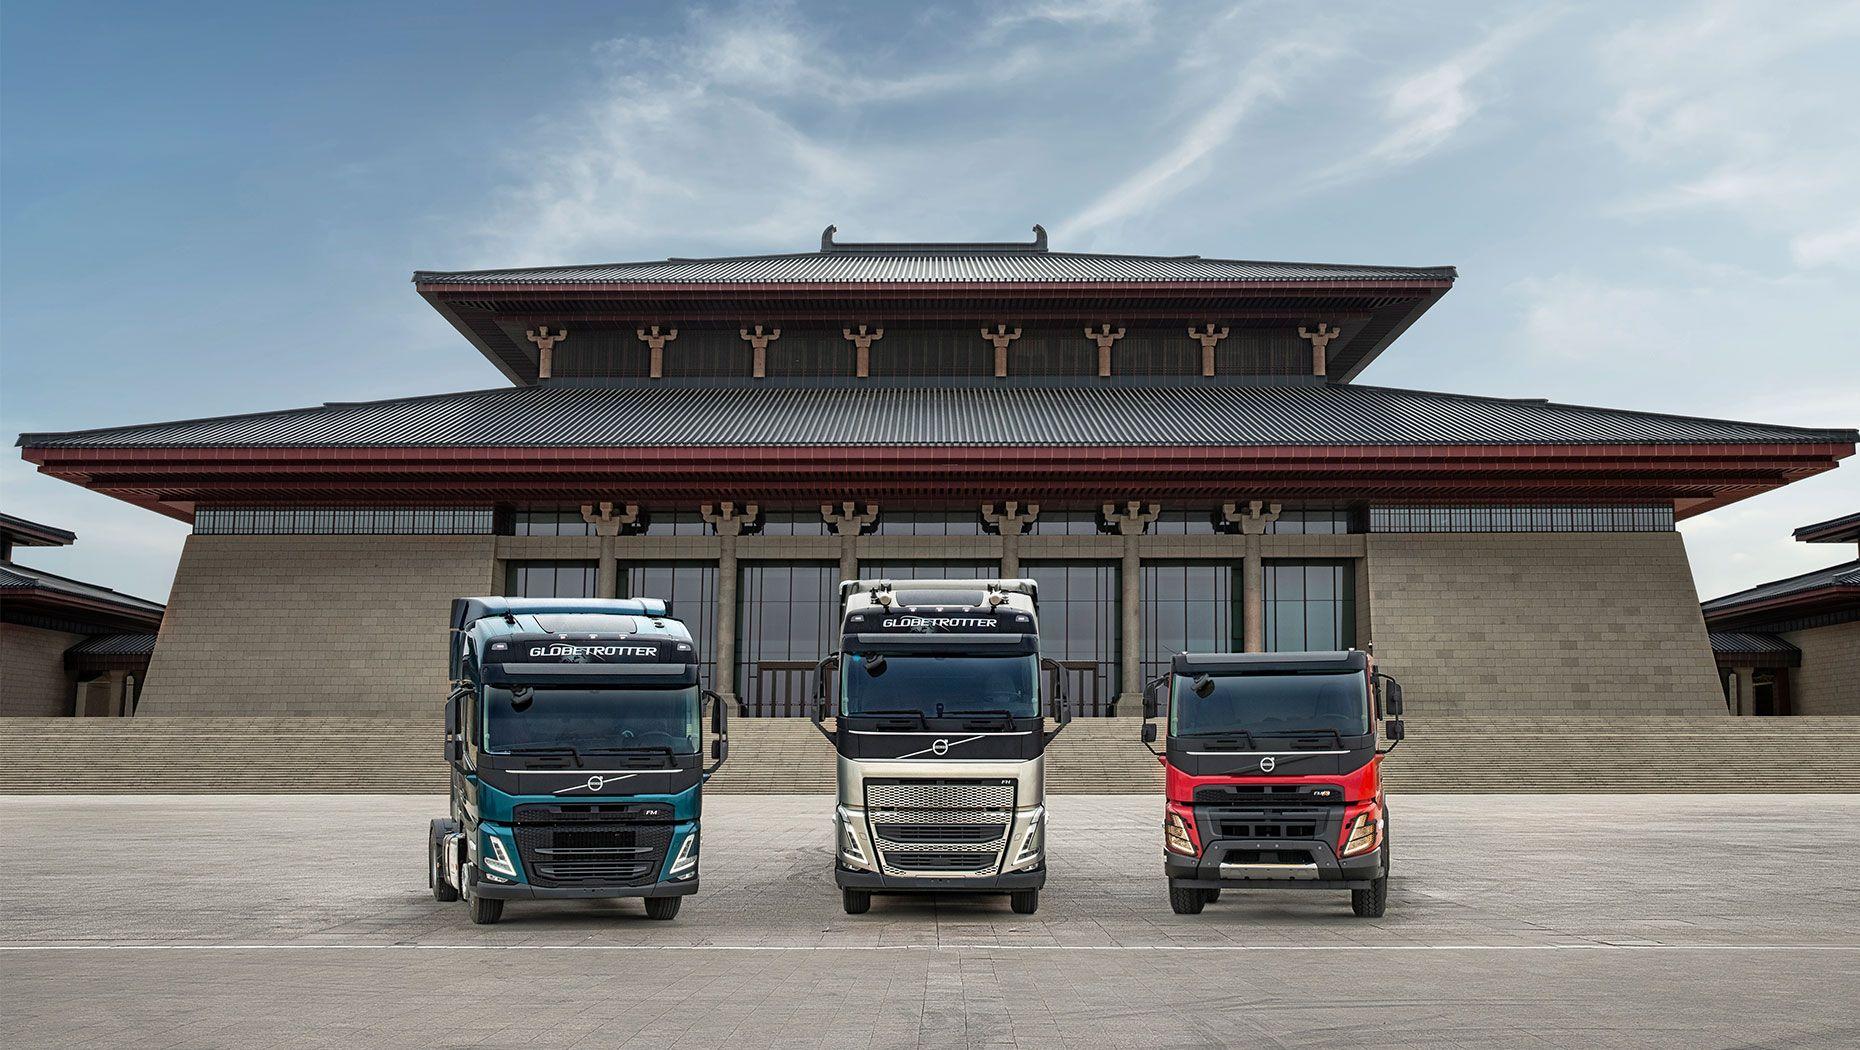 The new heavy-duty Volvo FH, Volvo FM and Volvo FMX trucks